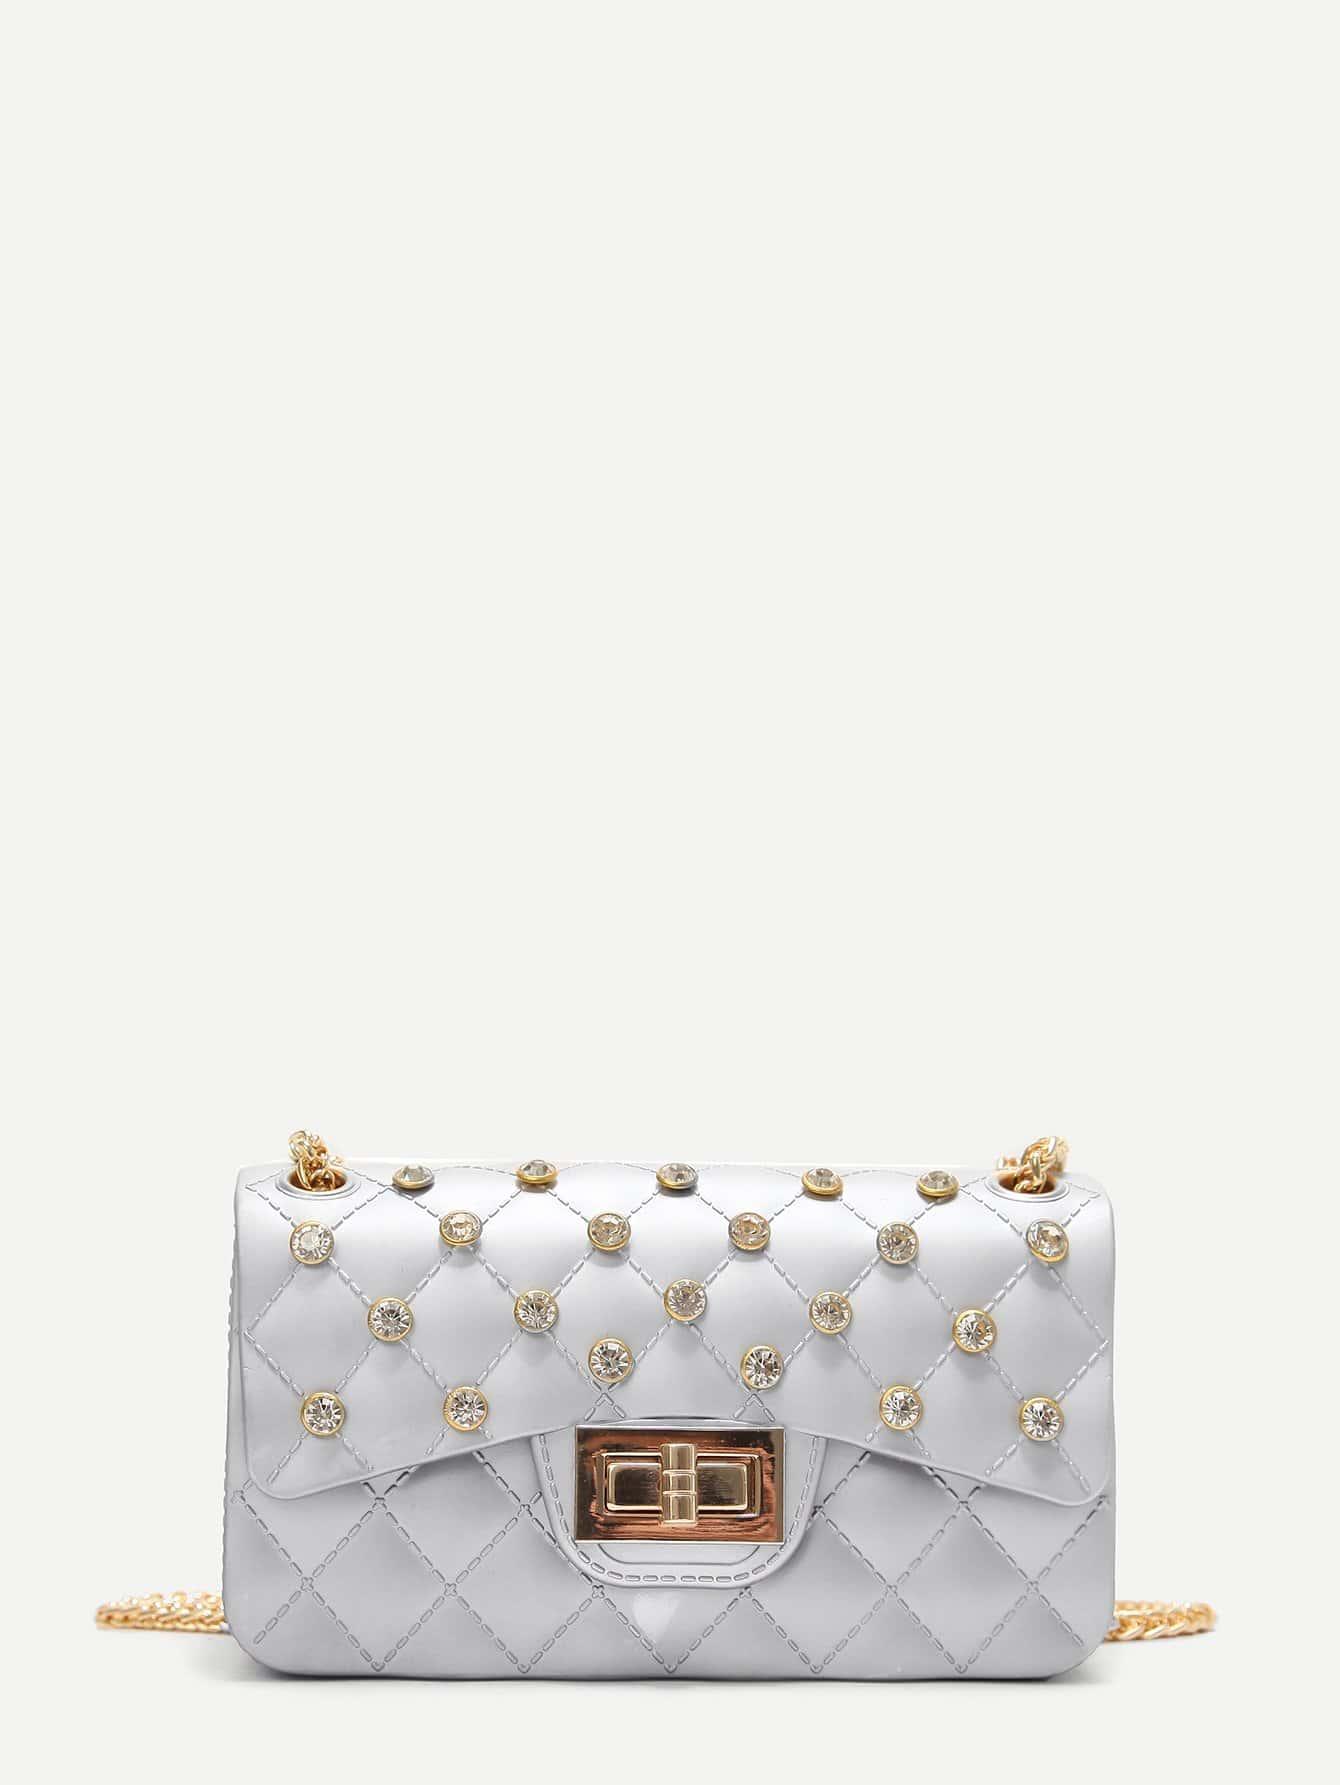 Twist Lock Quilted Chain Bag With Rhinestone 120cm 47 bronze twist o ring bag chain diy metal purse strap 20pcs freeshipping